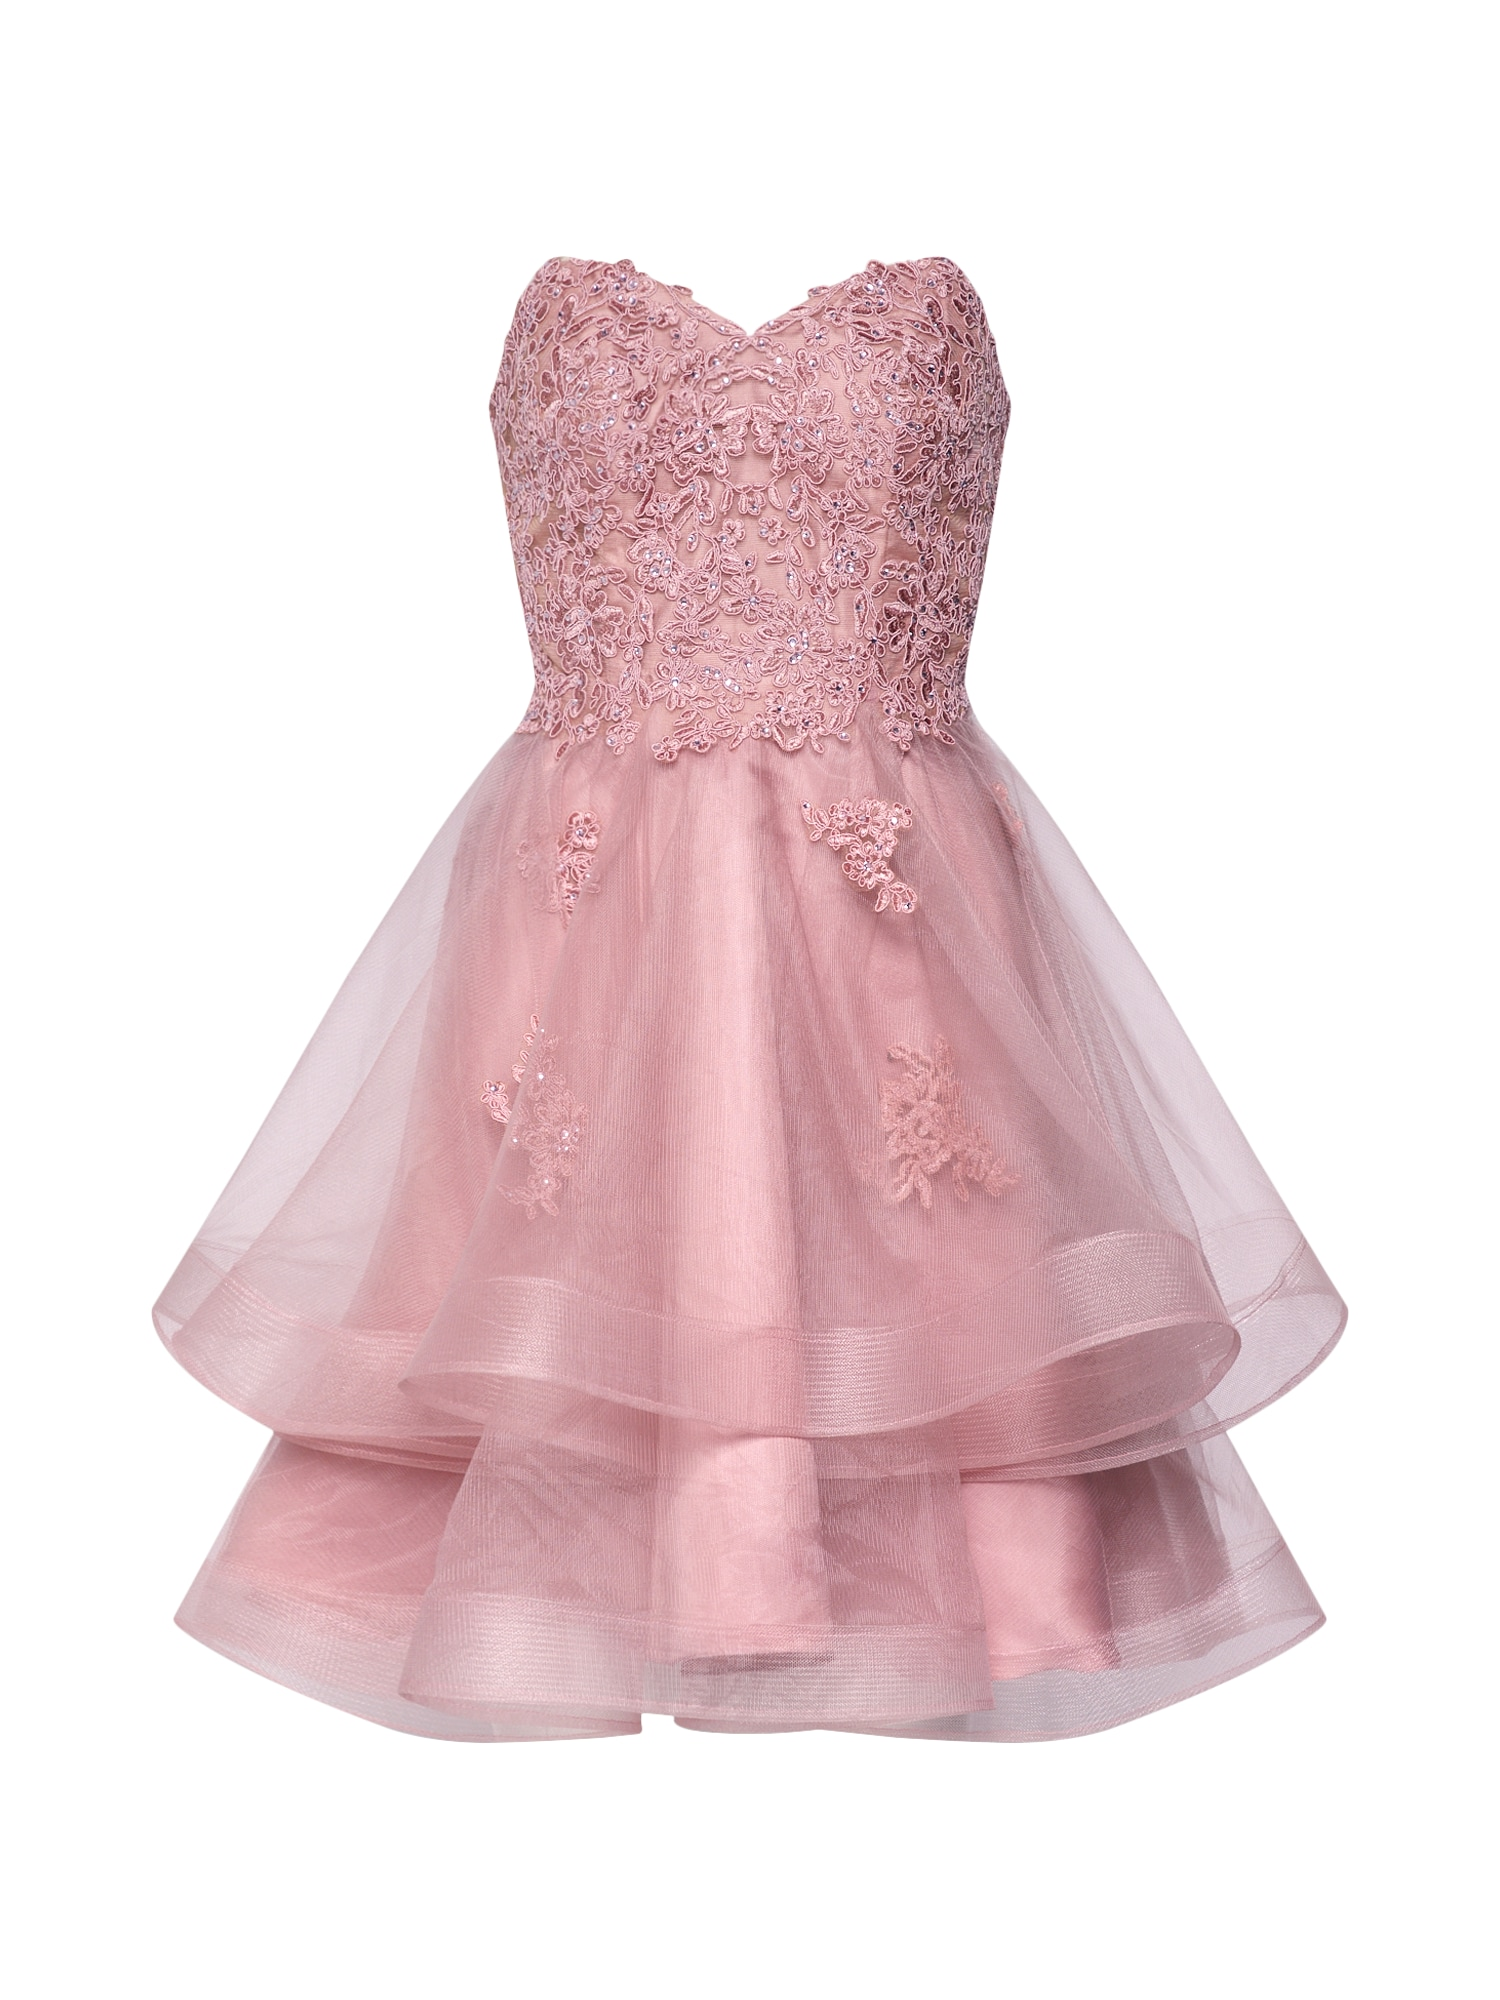 Laona Sukienka koktajlowa 'Cocktail dress'  bladofioletowy